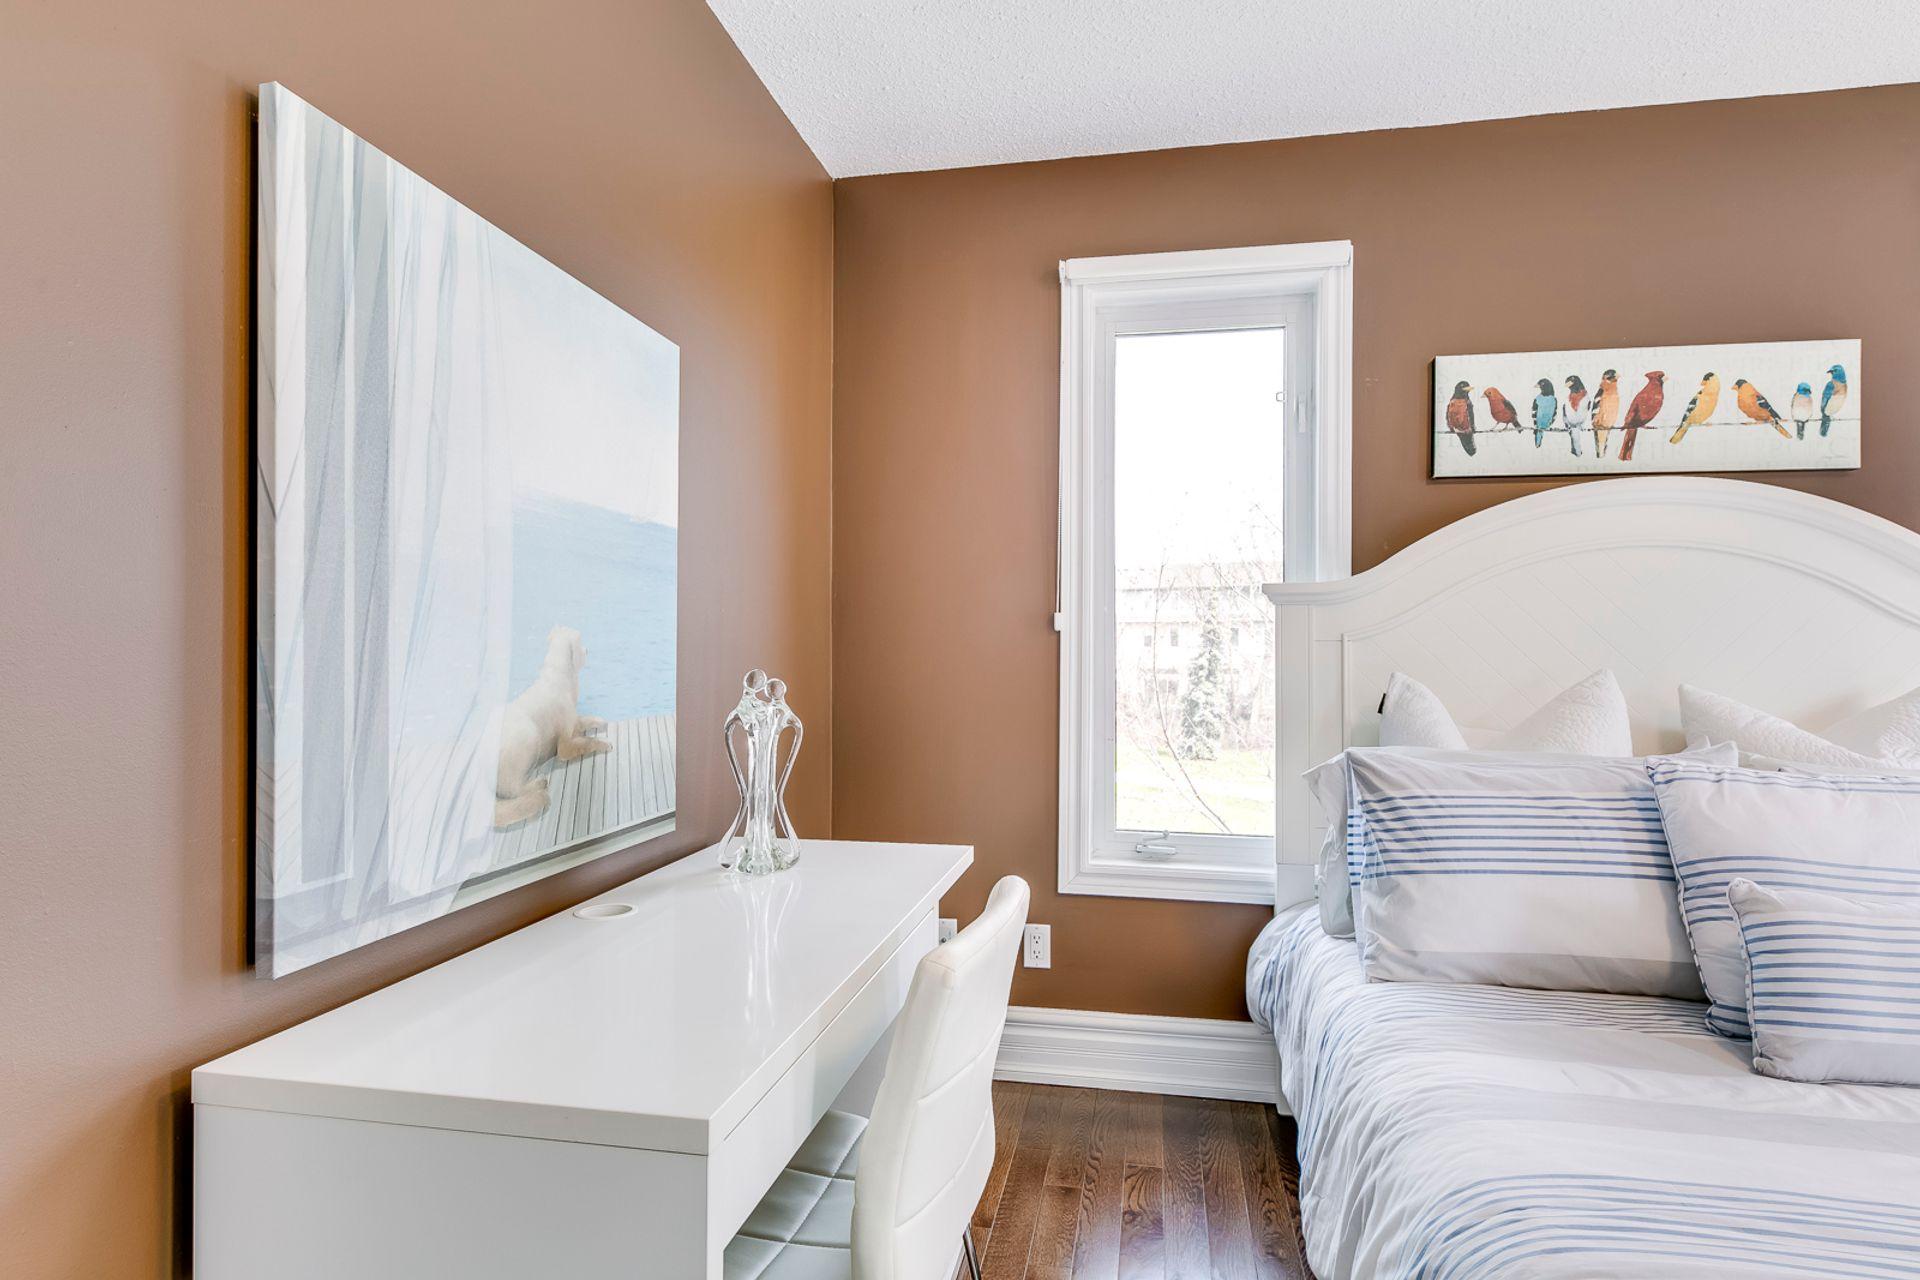 3rd Bedroom - 7 - 840 Dundas St W, Mississauga - Elite3 & Team at 7 - 840 Dundas Street W, Erindale, Mississauga